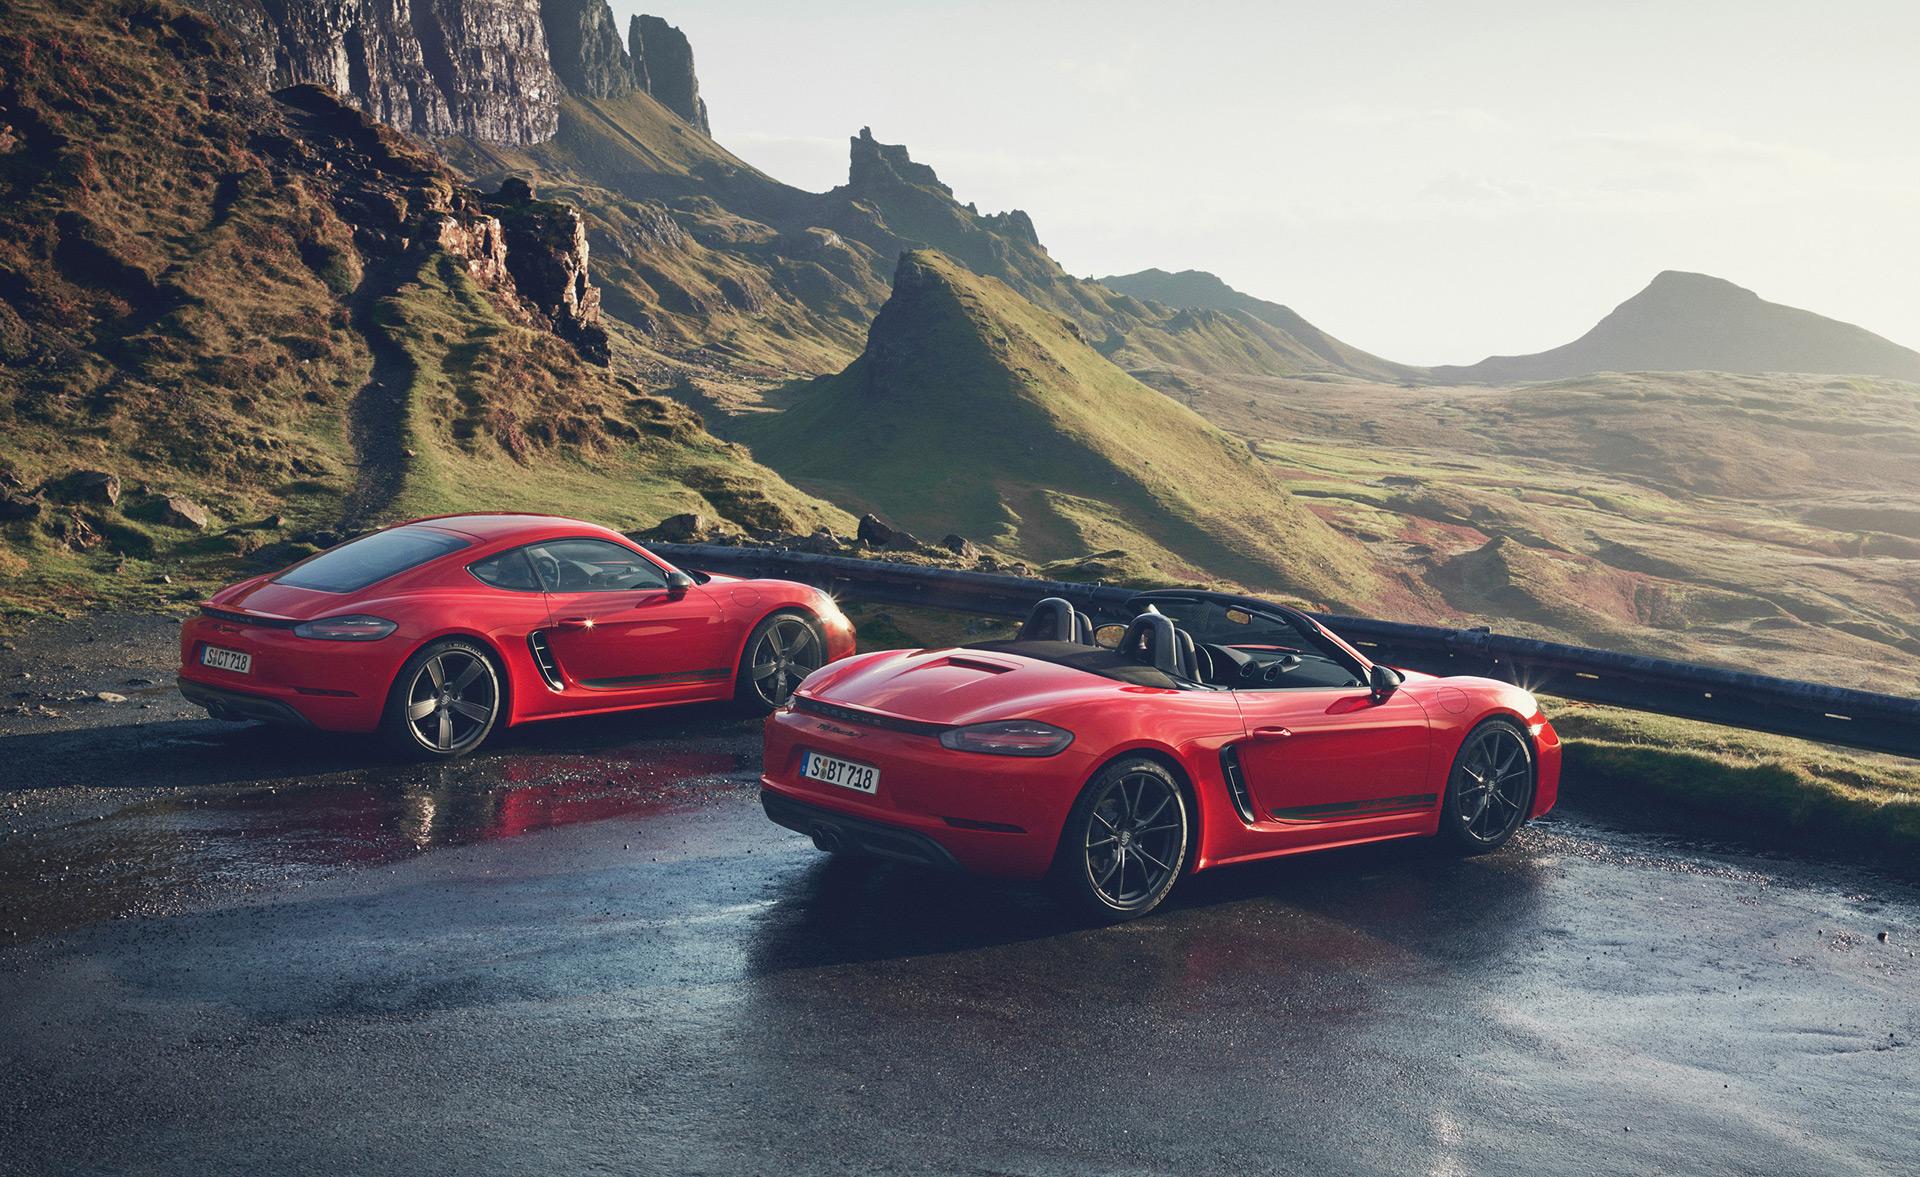 Porsche Centre Langley    点燃您驾驶的激情,打造仅属于您的梦想座驾